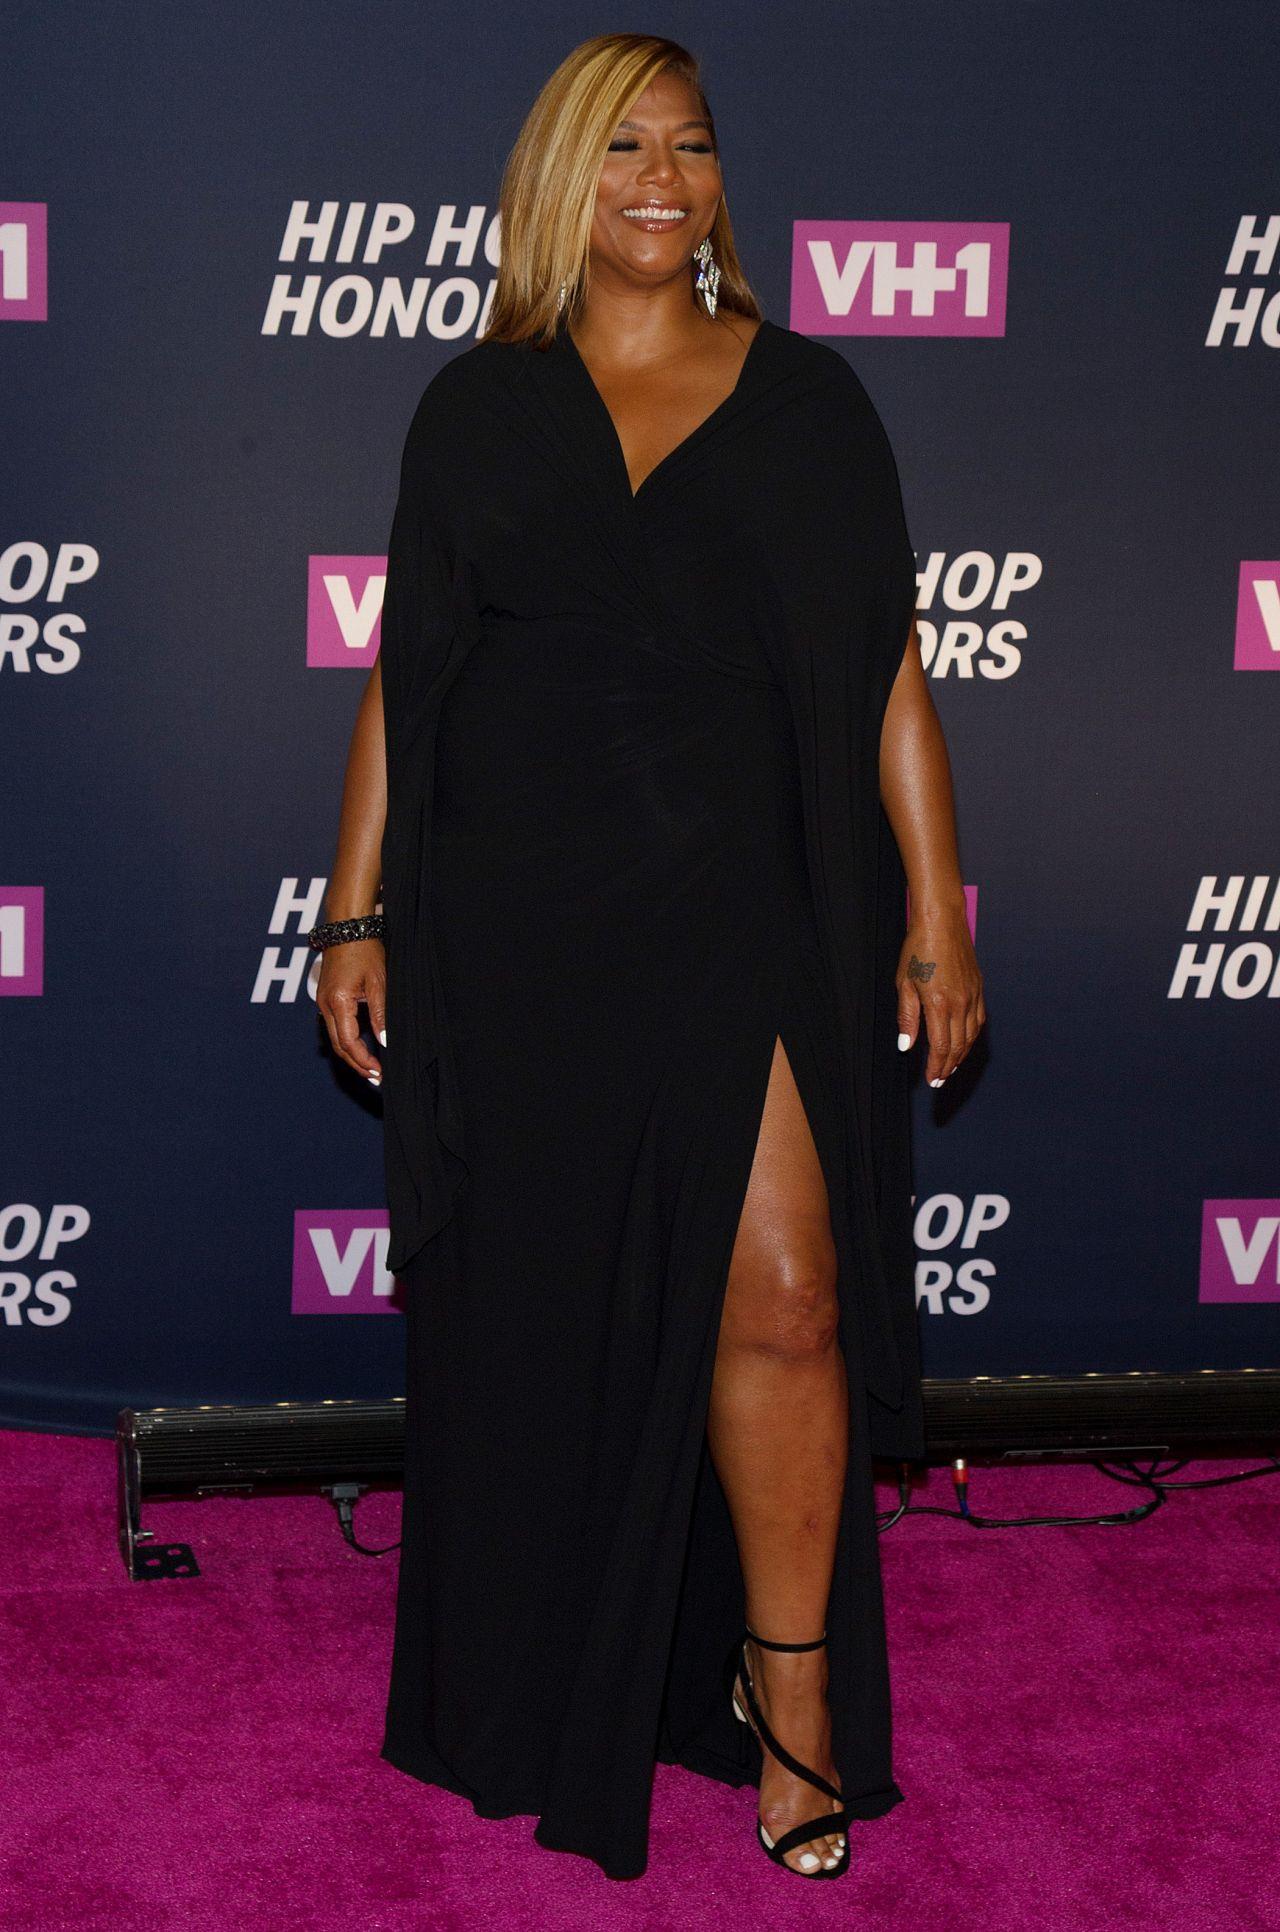 Queen Latifah – VH1 Hip Hop Honors in New York City, July 2016